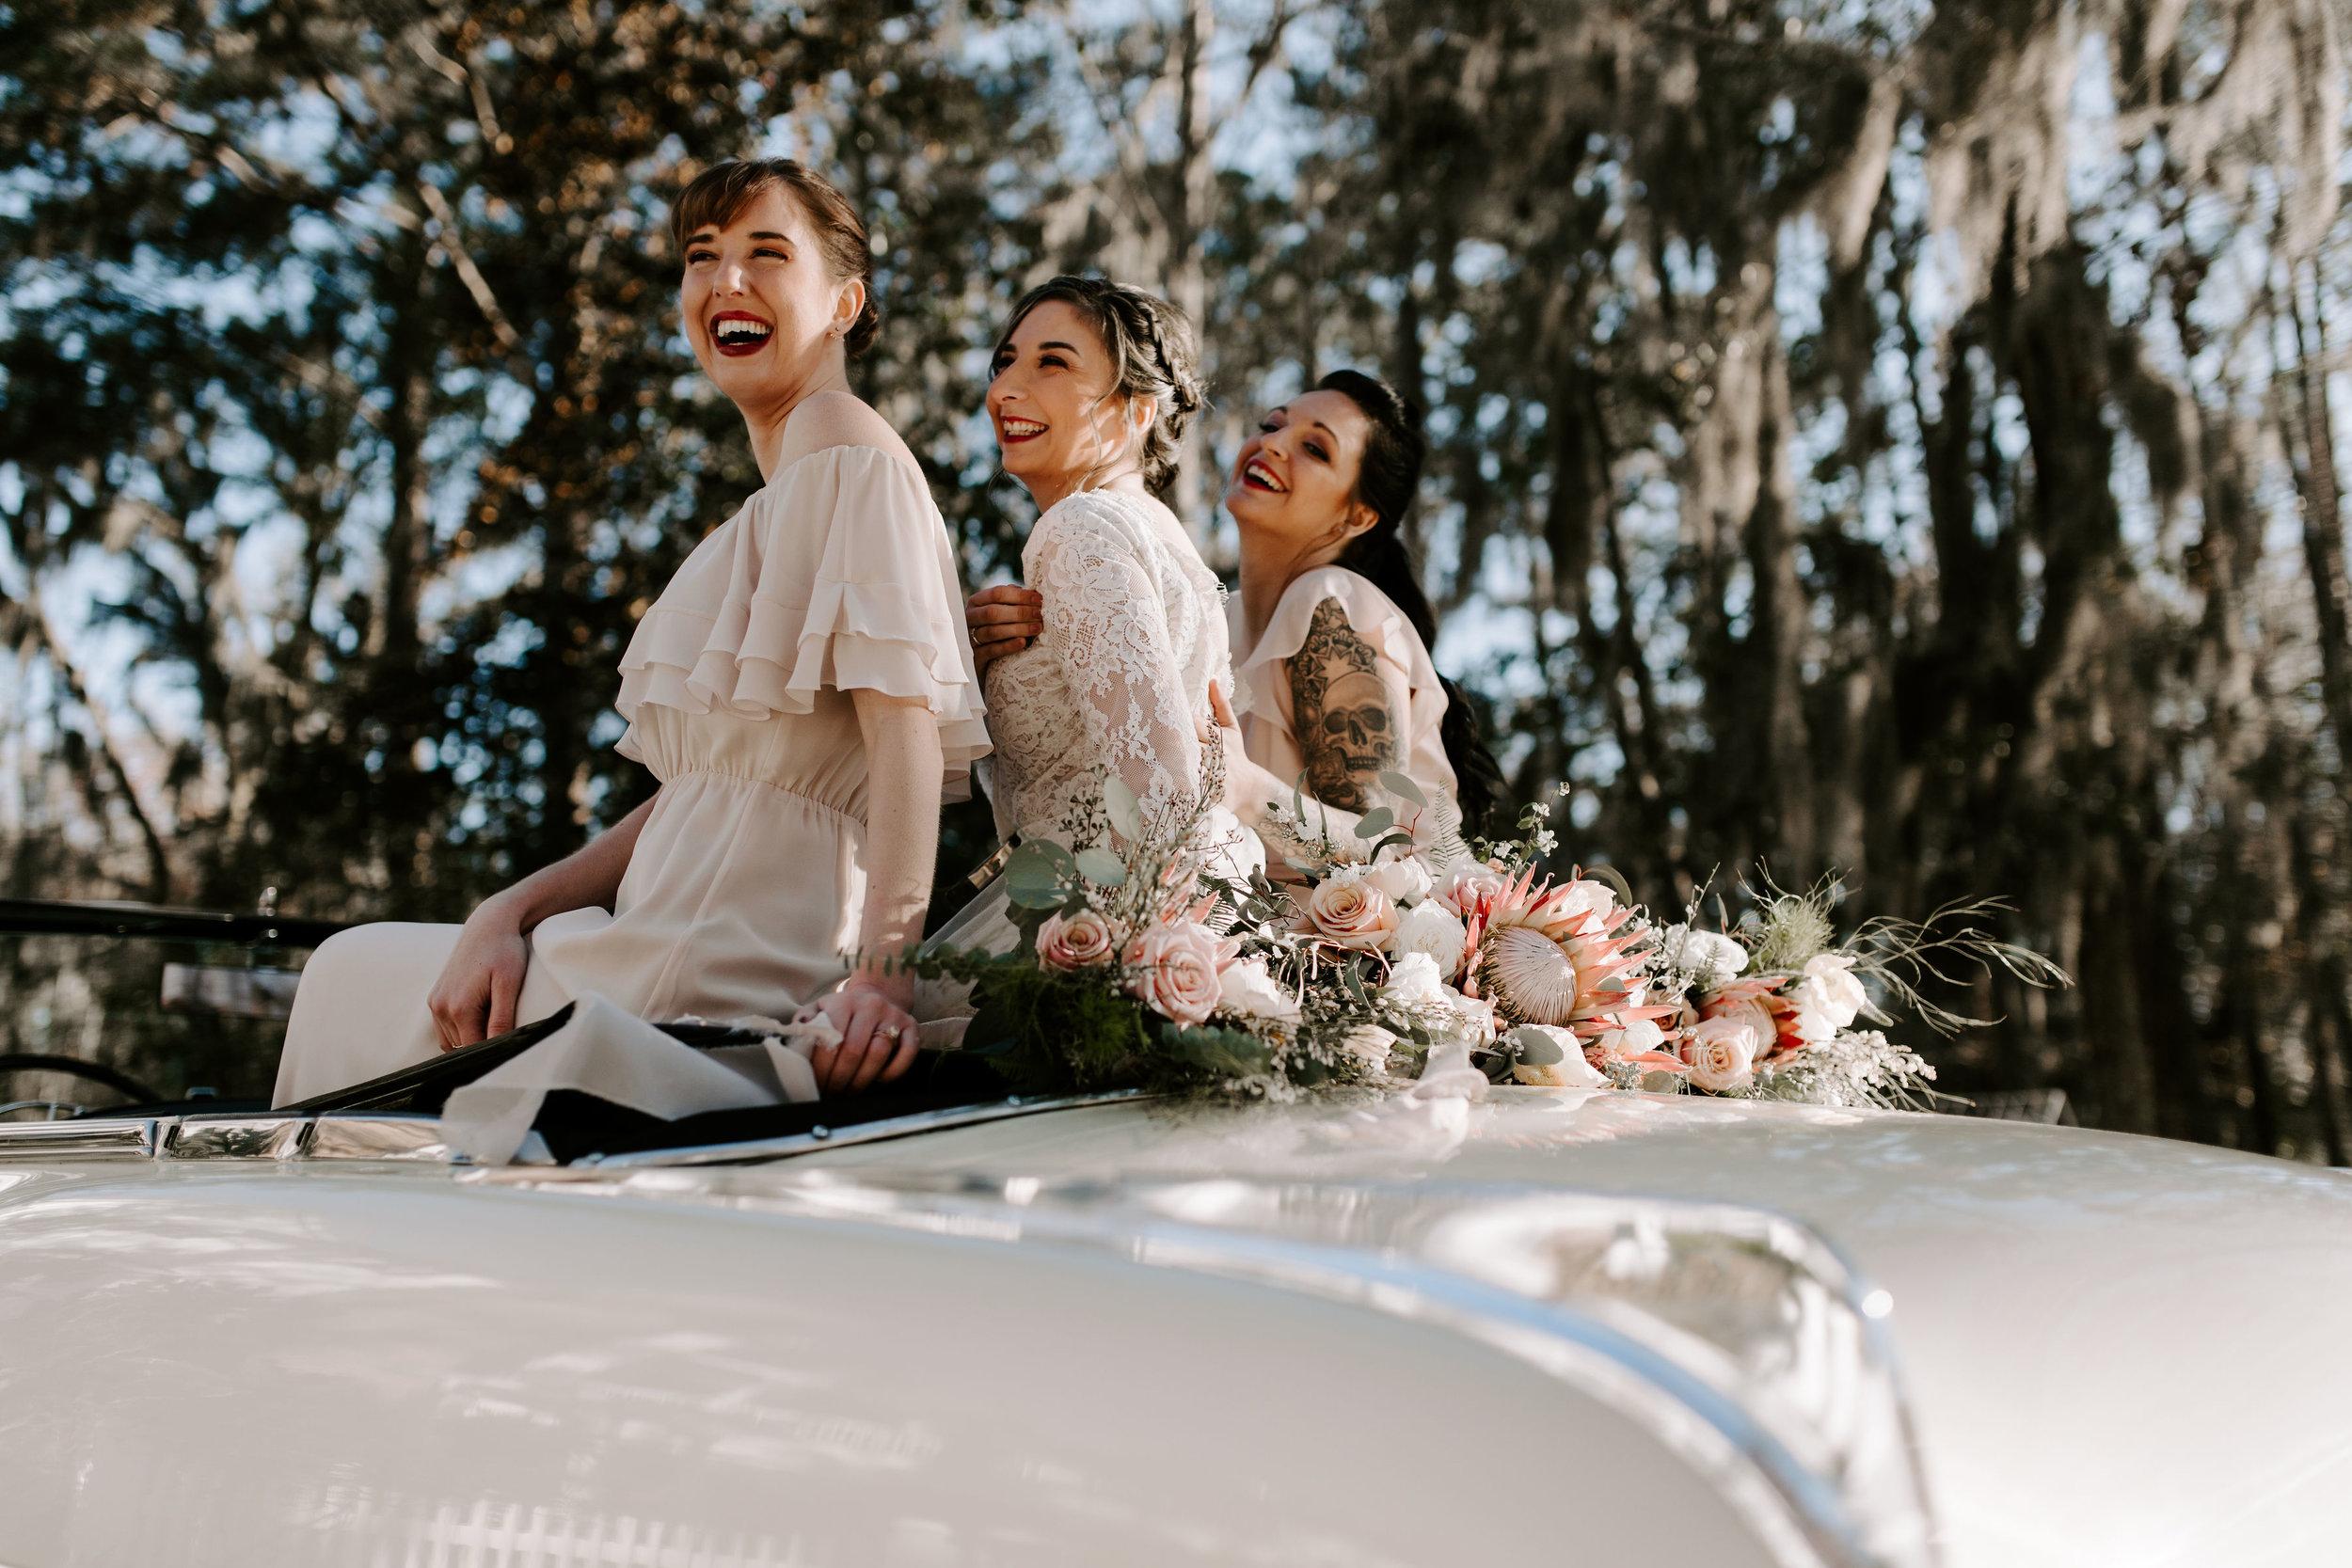 ivory-and-beau-blog-mackey-house-styled-shoot-savannah-wedding-bridal-boutique-savannah-florist-southern-wedding-_G5A2455.jpg